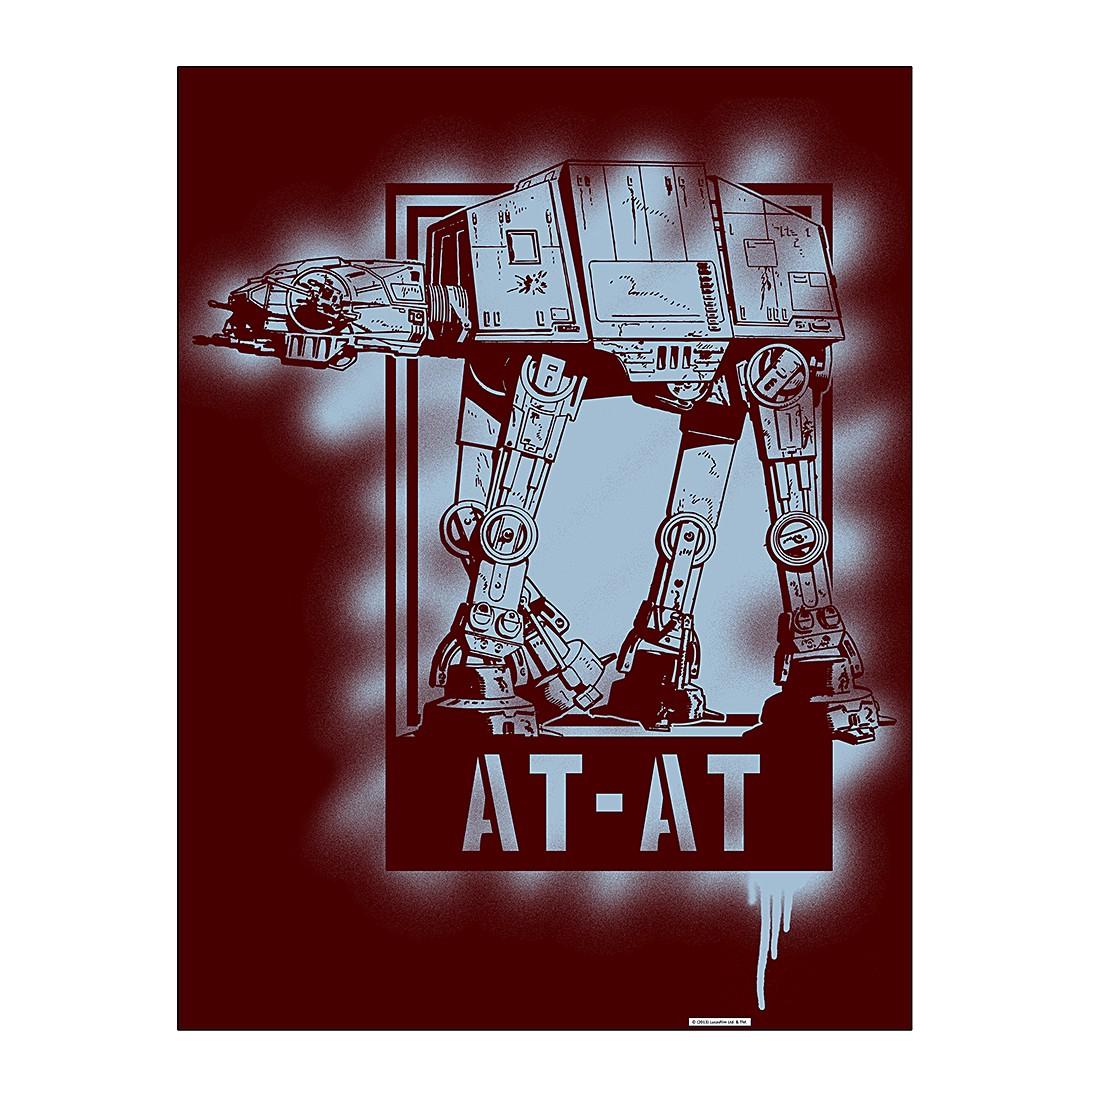 Aluminiumbild AT-AT Artwork – 100 x 75 cm, Gallery of Innovative Art jetzt bestellen